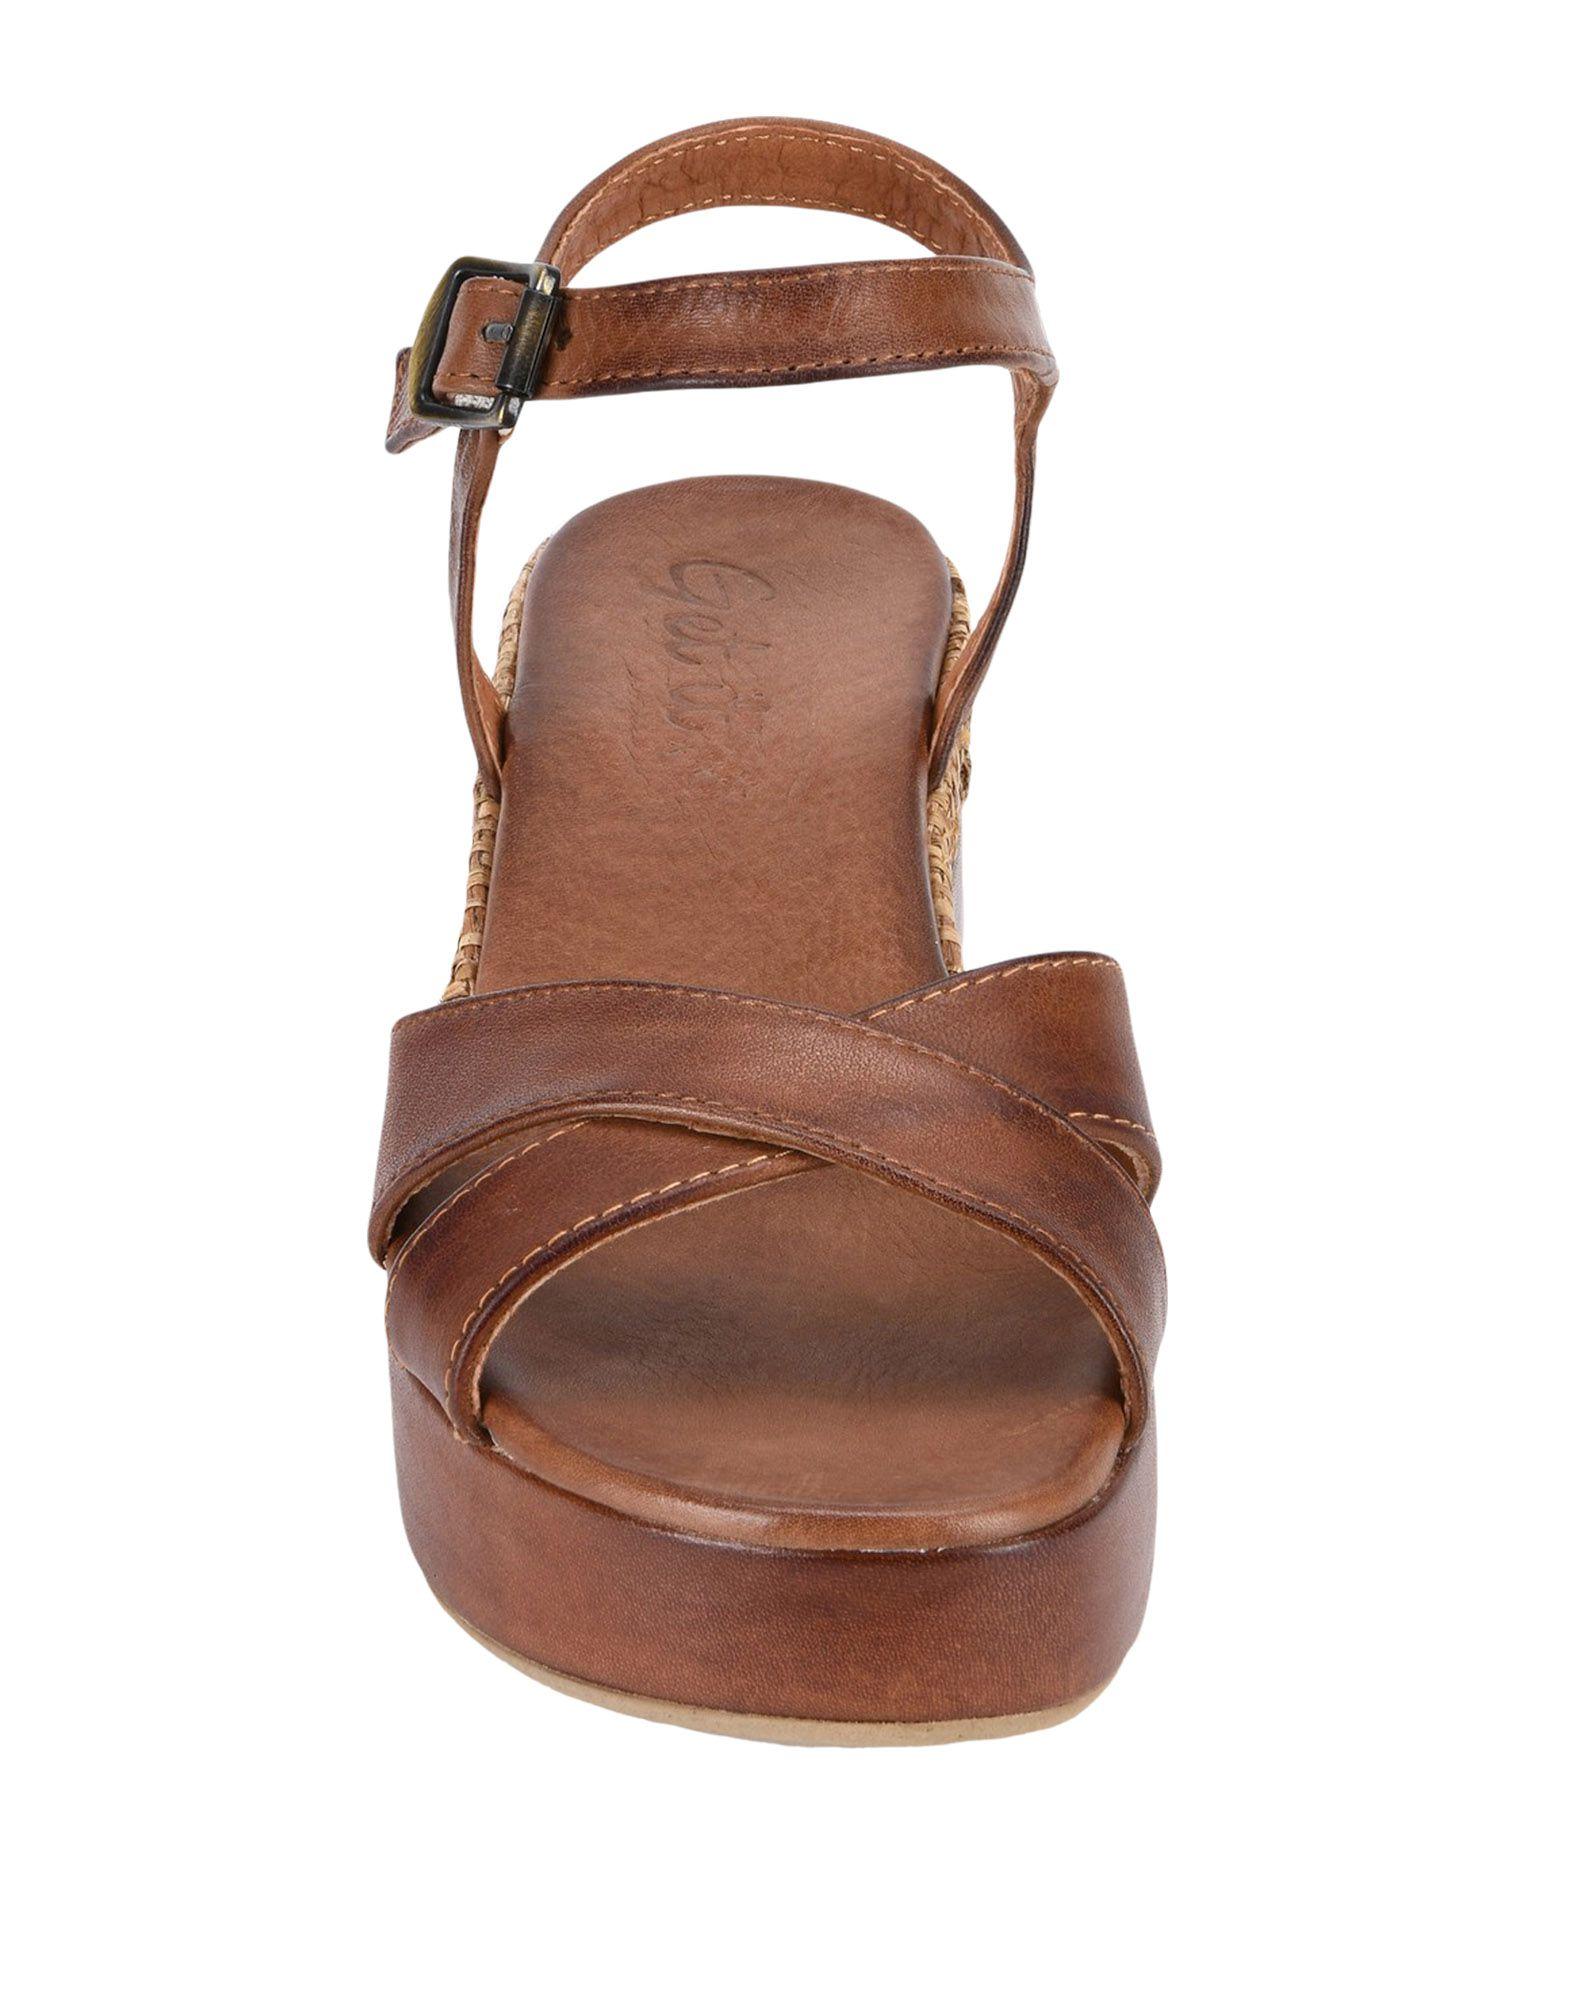 Get Gute It Sandalen Damen 11437025WE Gute Get Qualität beliebte Schuhe 25deaf